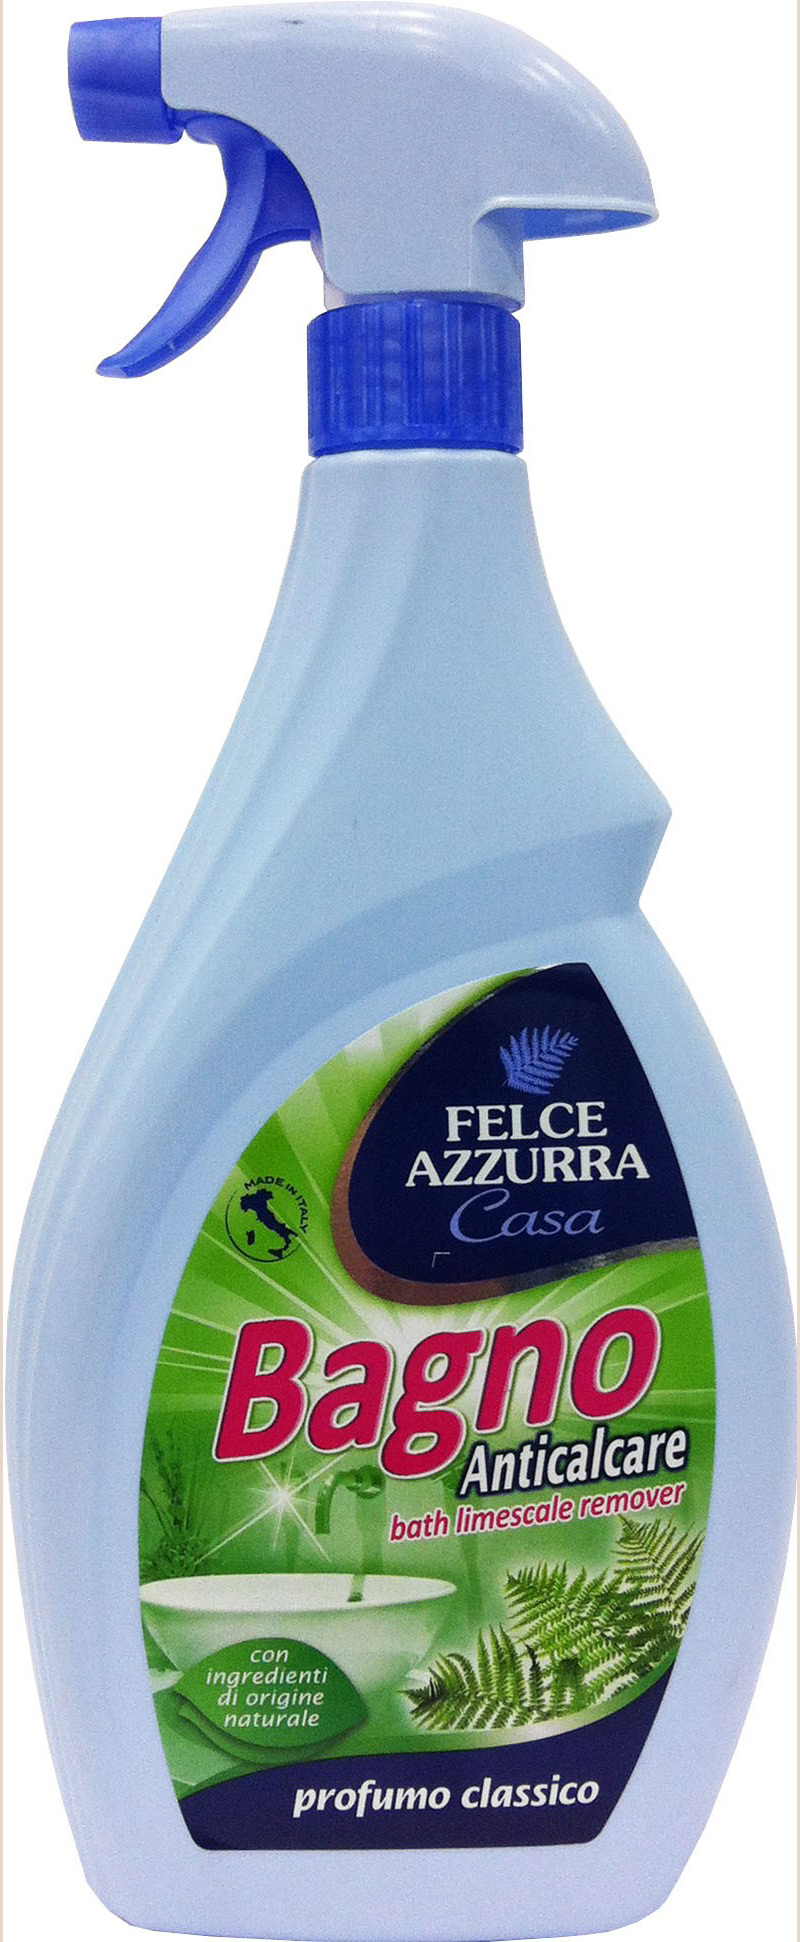 FELCE CASA BAGNO ANTICALCARE 750 ML